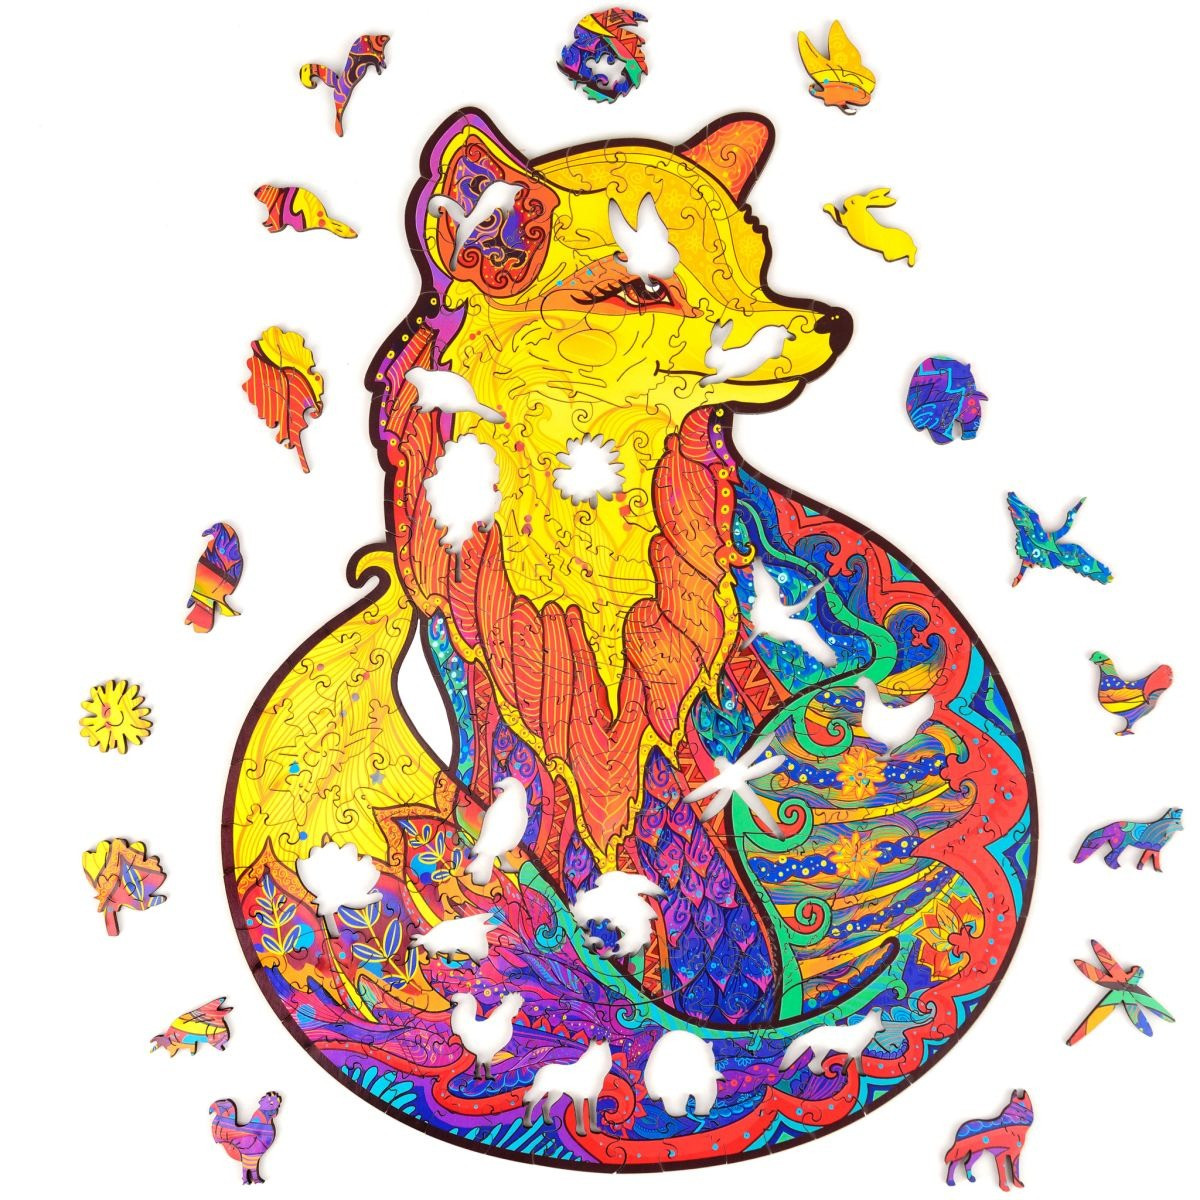 "Дизайнерские пазлы из дерева Лисица А5 ""Wooden jigsaw puzzle - Fox"", деревянные пазлы (дерев яний пазл) (NS)"